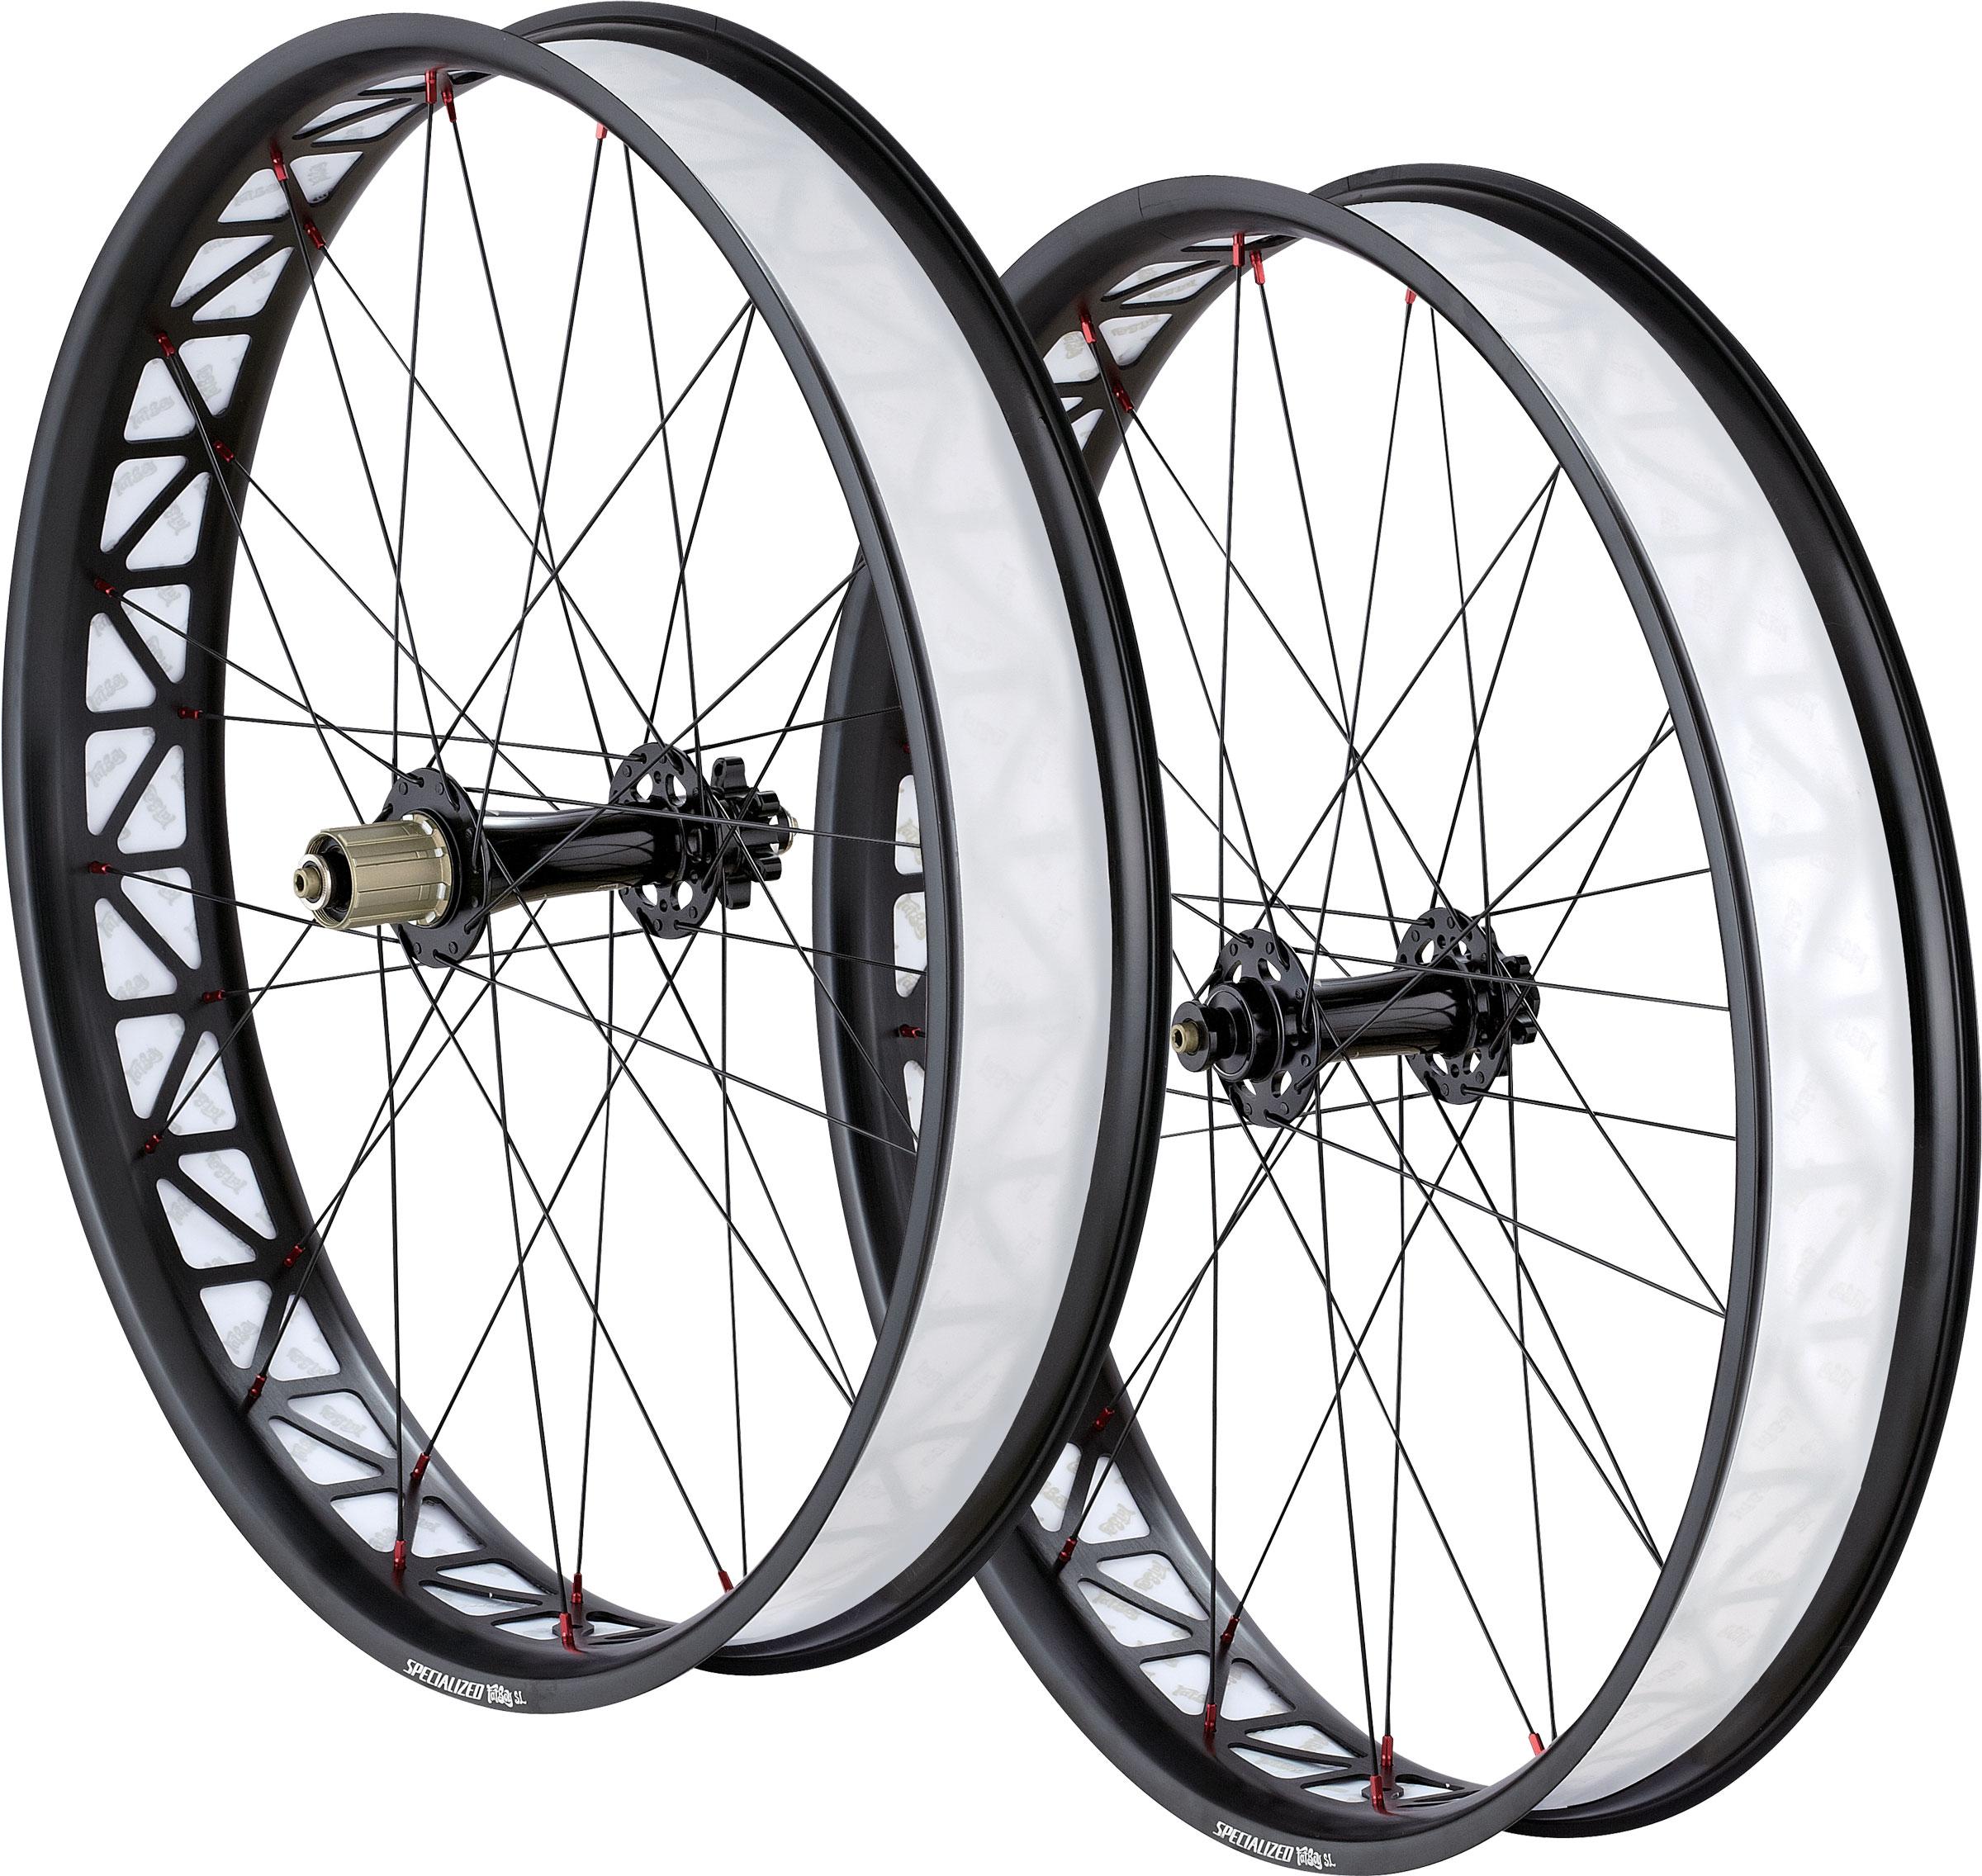 Roval Fatboy Sl Wheelset Wheel World Bike Shops Road Bikes